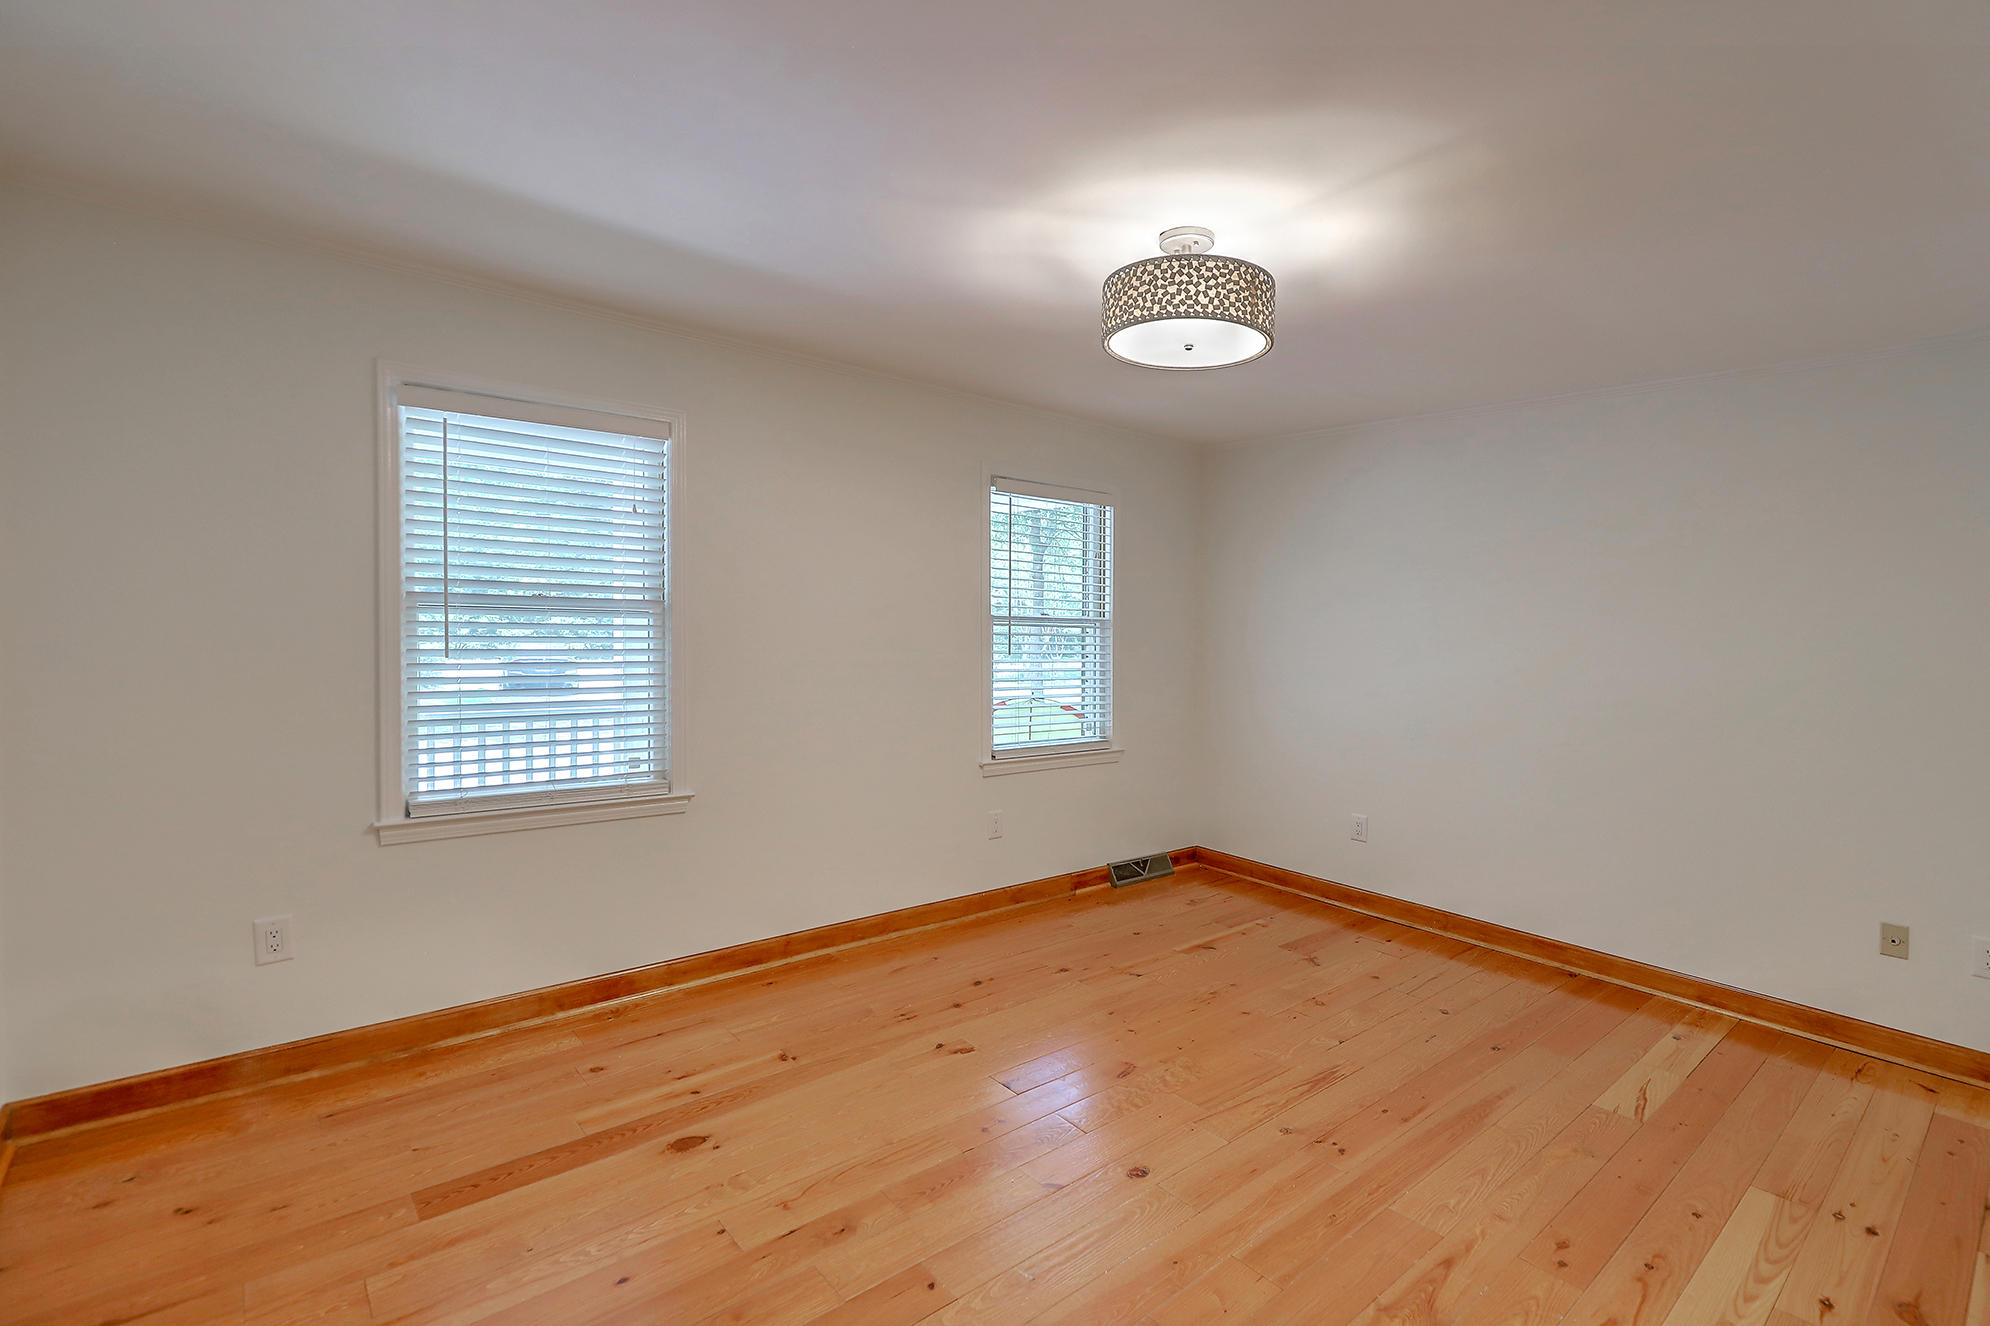 Edgewater Park Homes For Sale - 1413 Edsent, Charleston, SC - 24